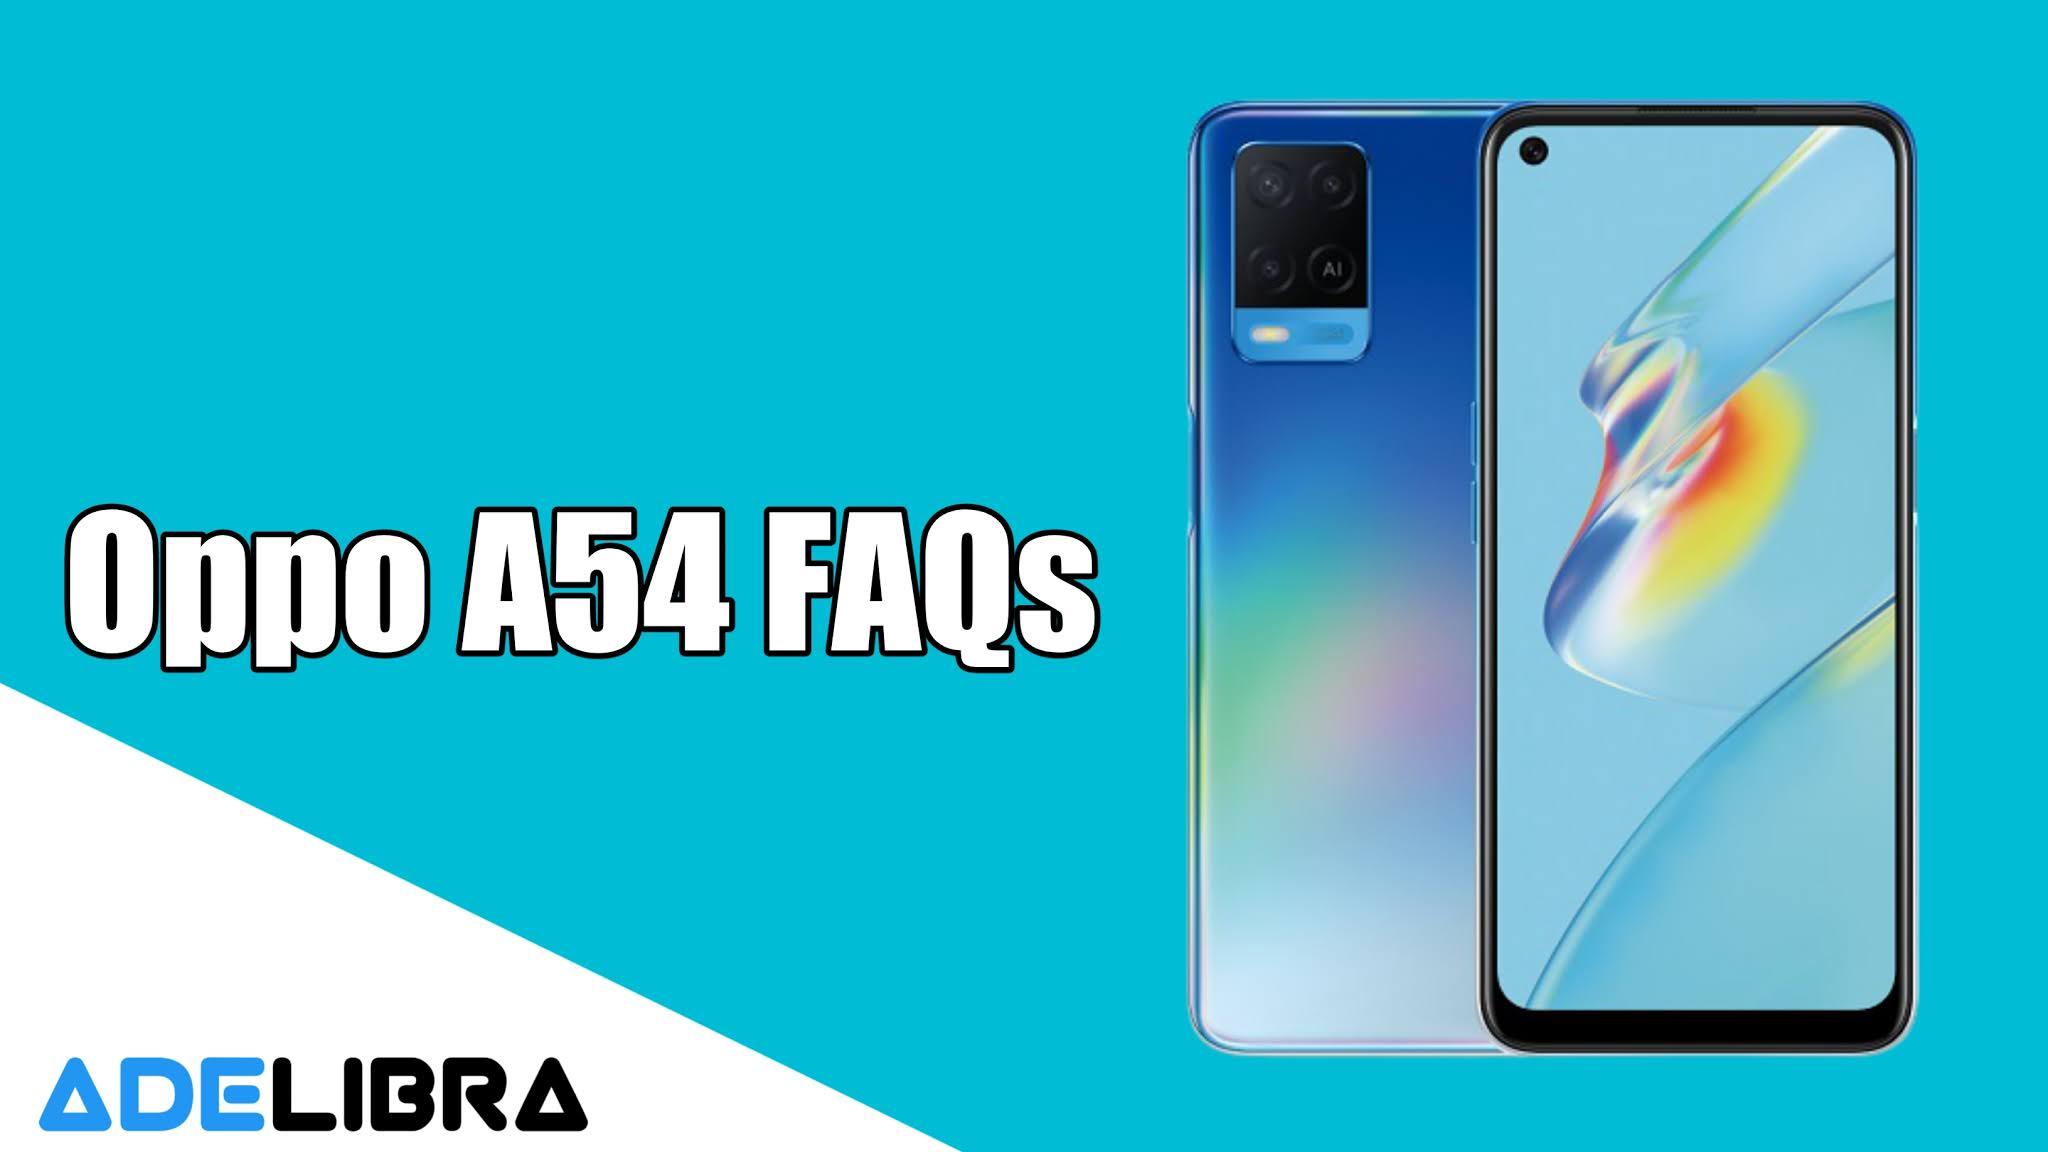 Oppo A54 FAQs